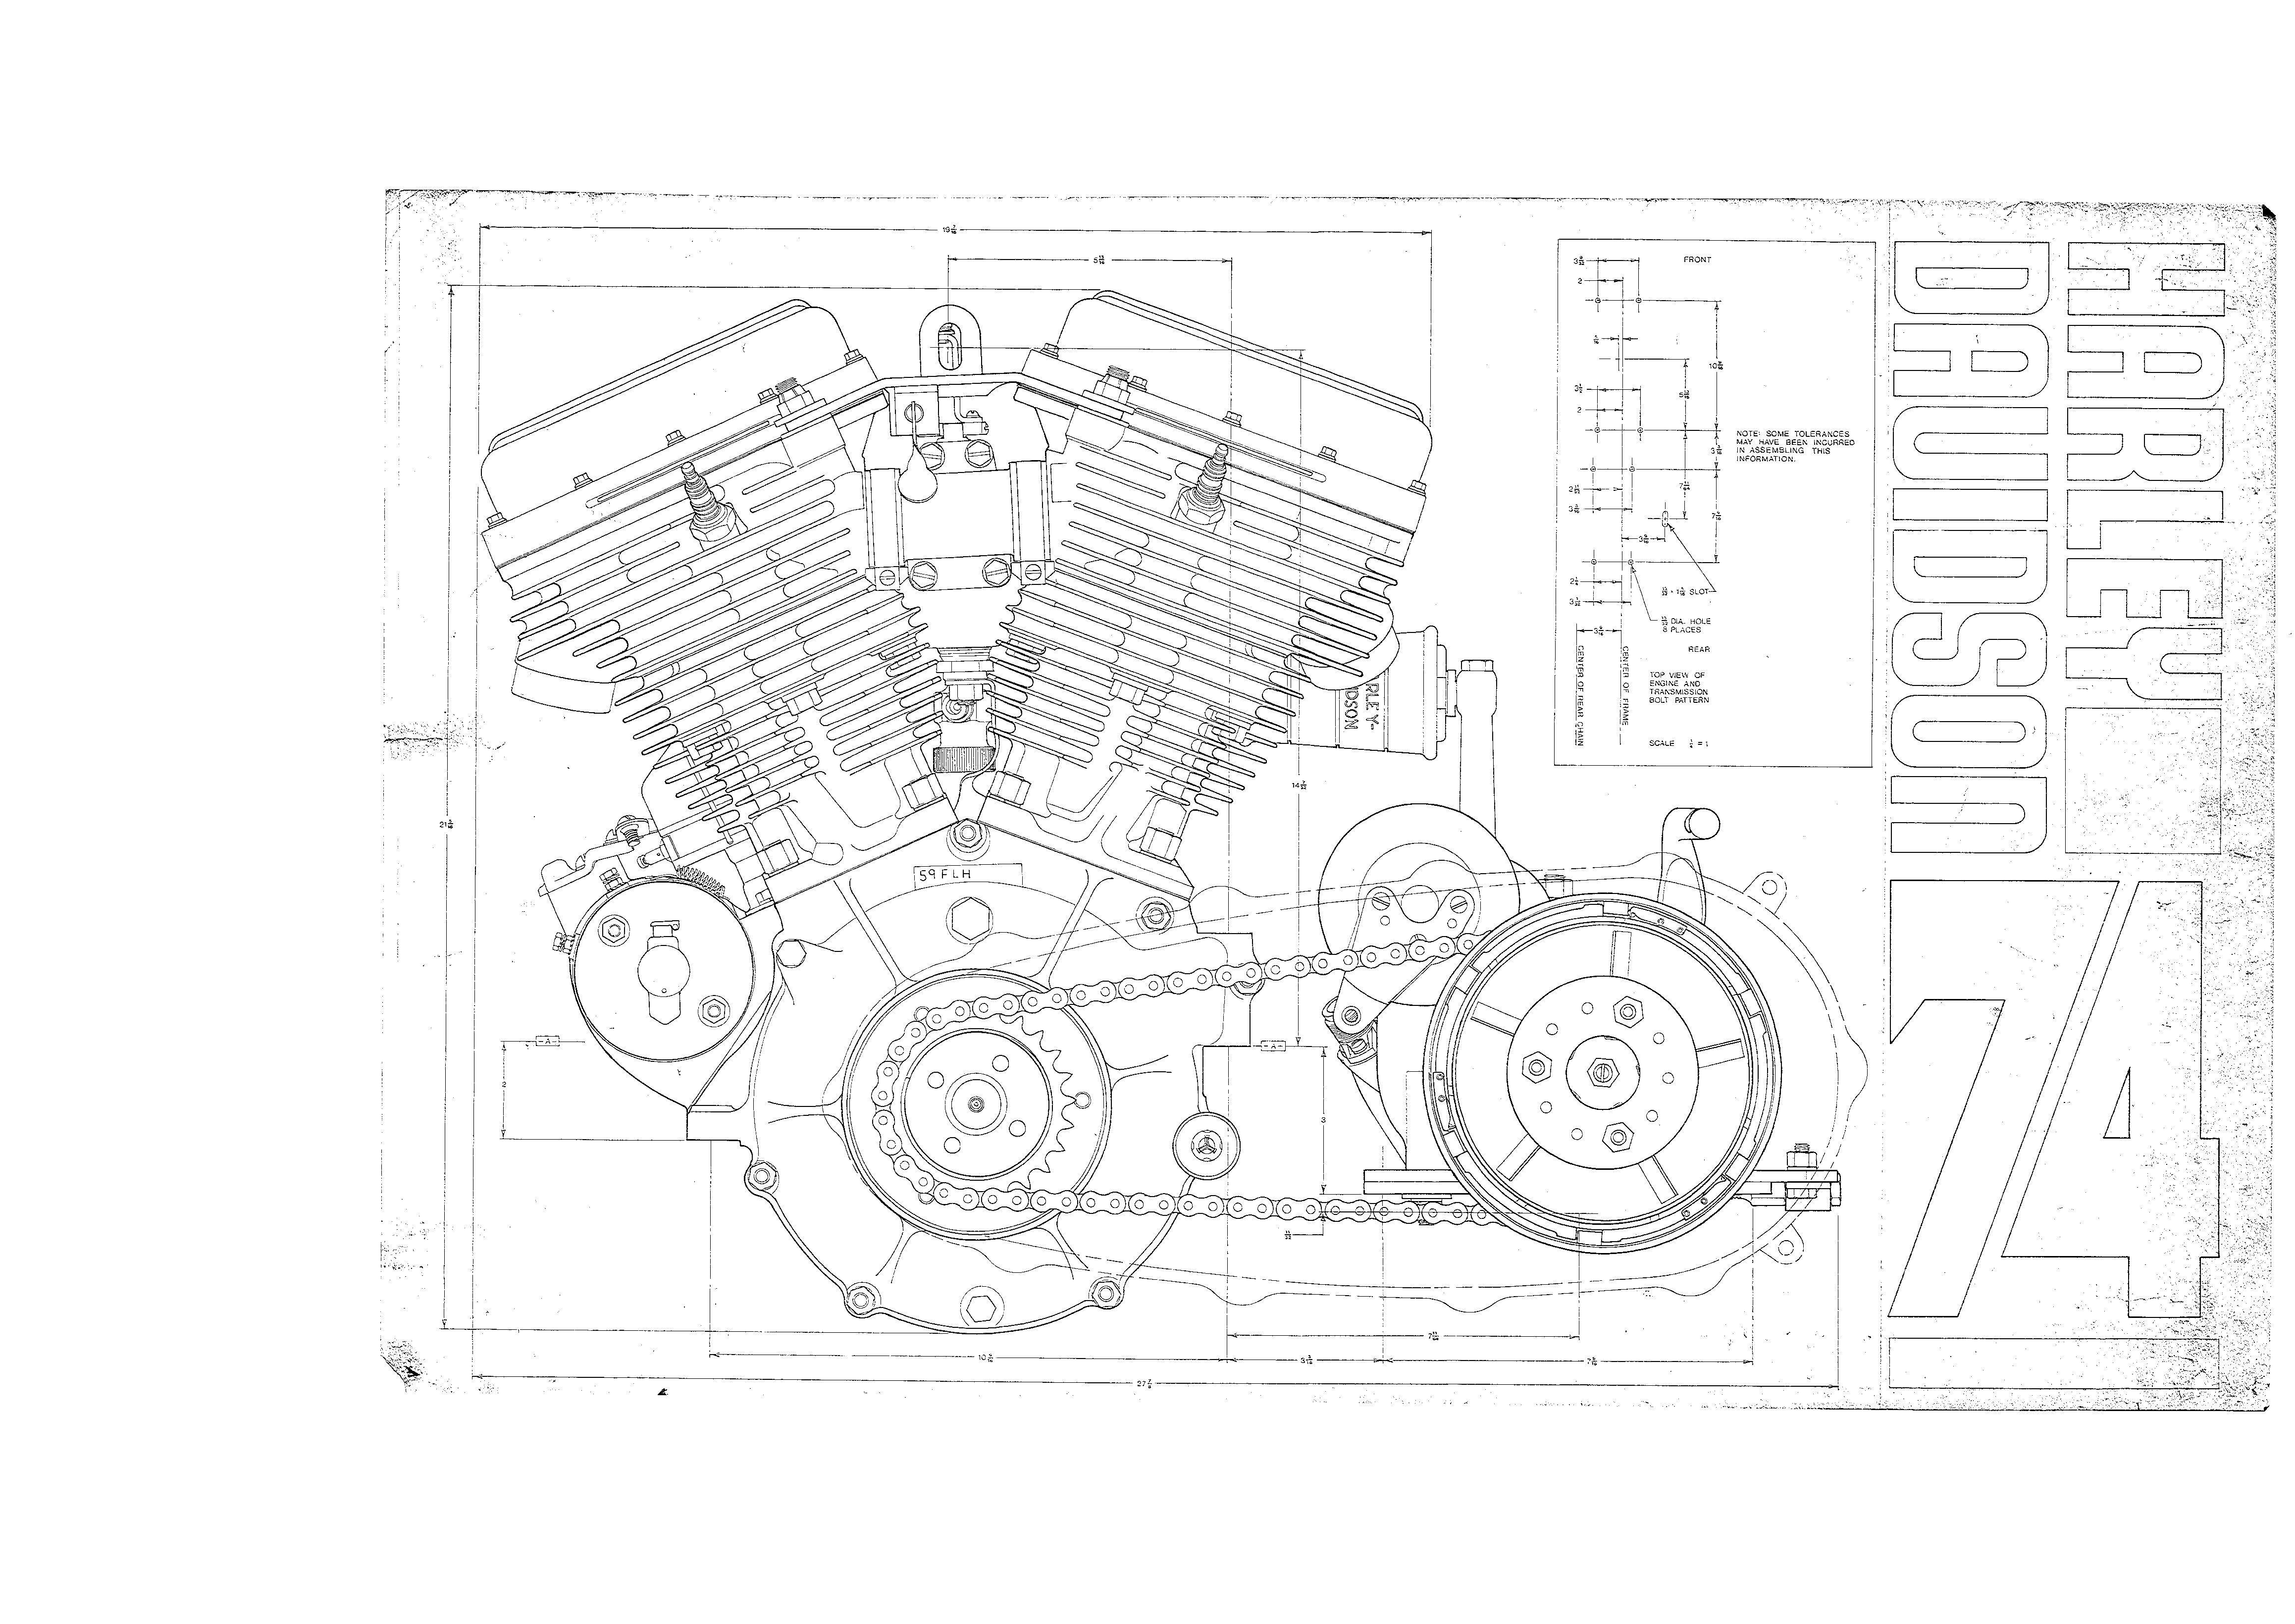 medium resolution of harley davidson motor harley davidson forum bike engine prop design custom harleys character design references engineering motorcycle